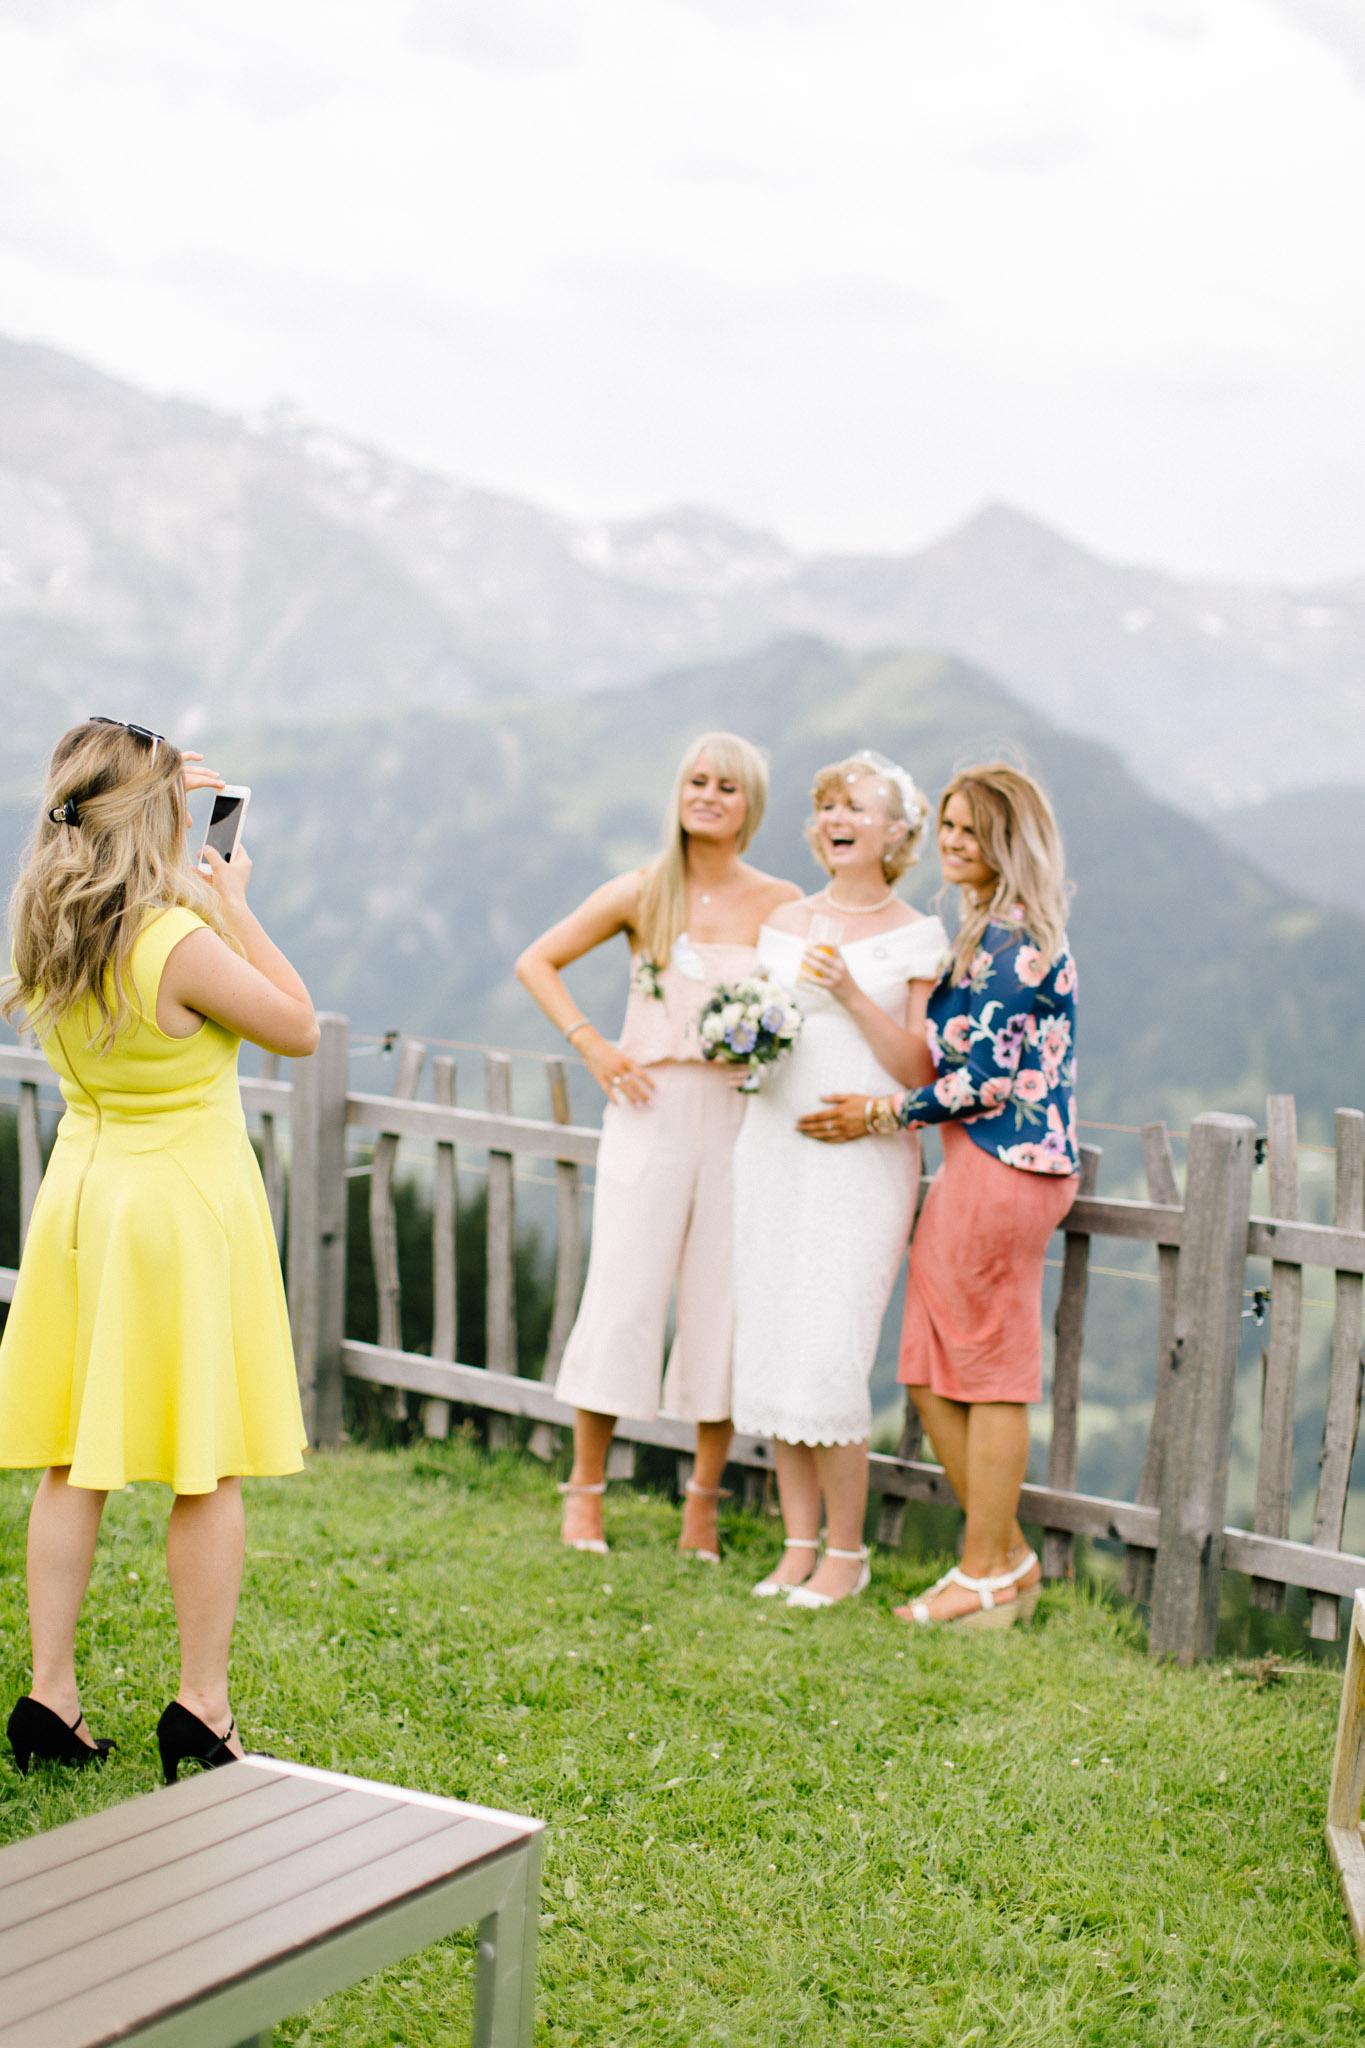 Lenl-Simmental-Buehlerhof-Pia-Anna-Christian-Wedding-Photography-EK-69.jpg